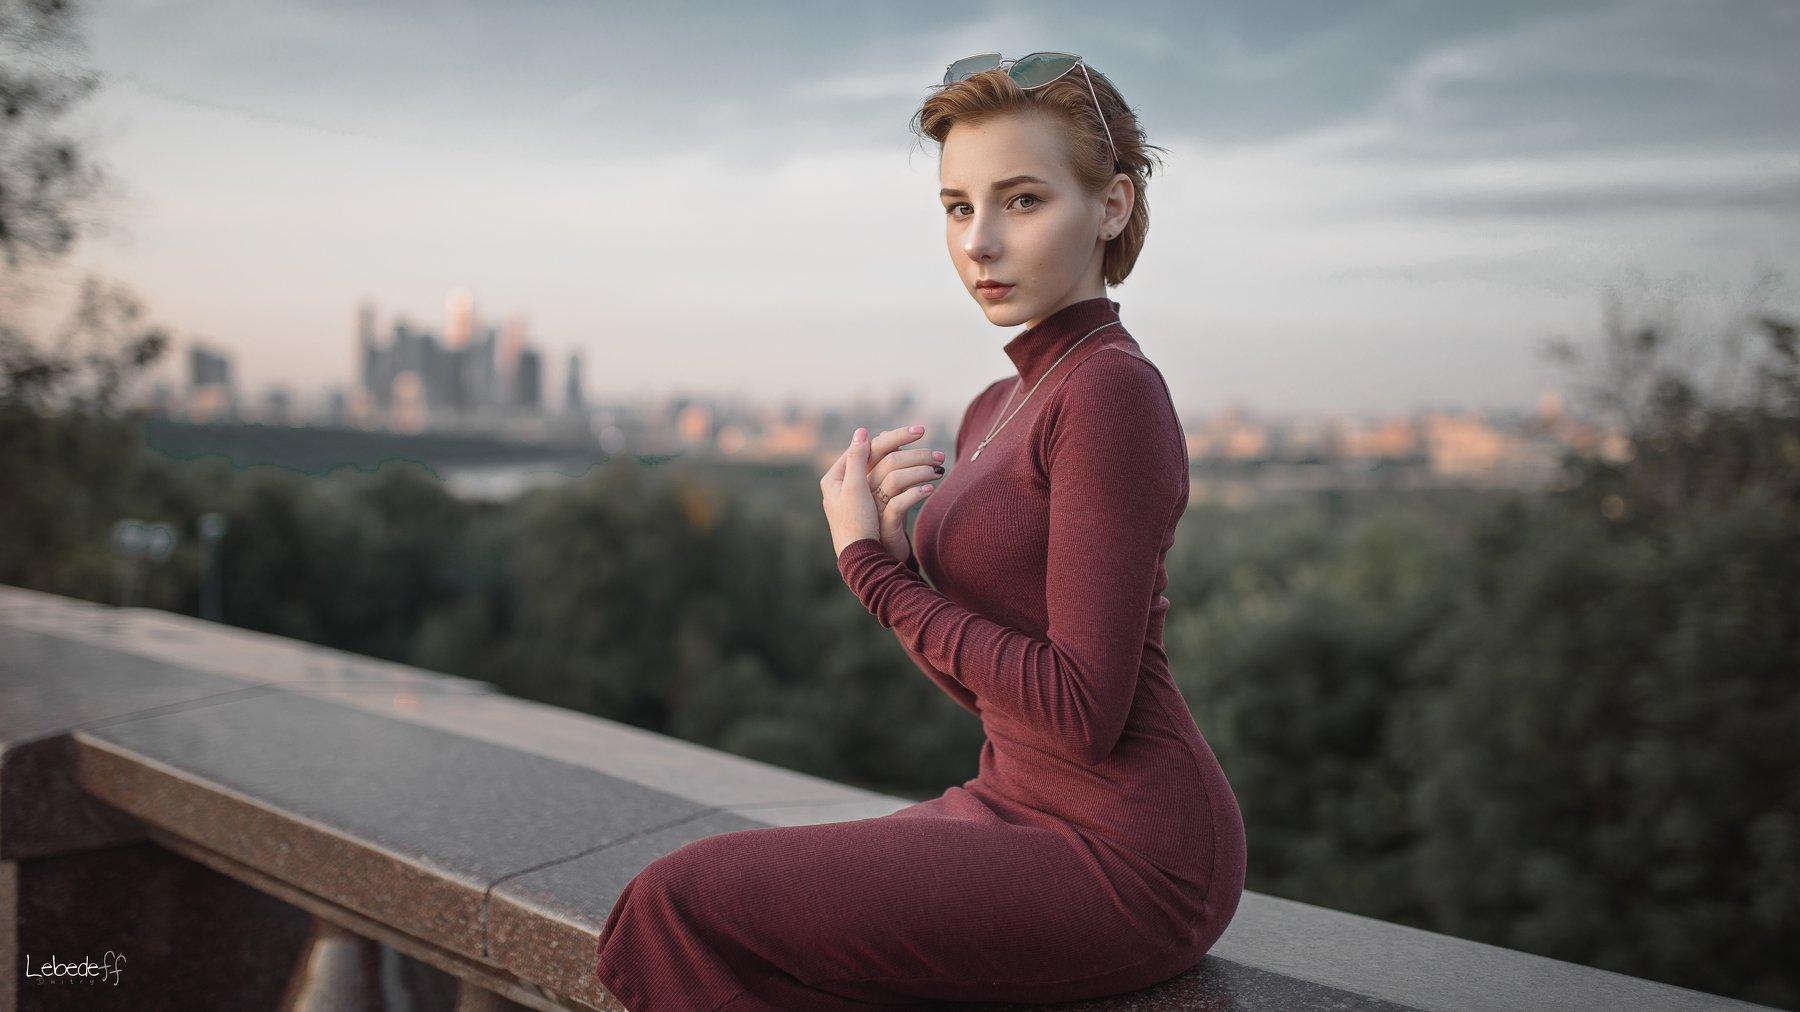 lady, портрет, art, model, Лебедев Дмитрий